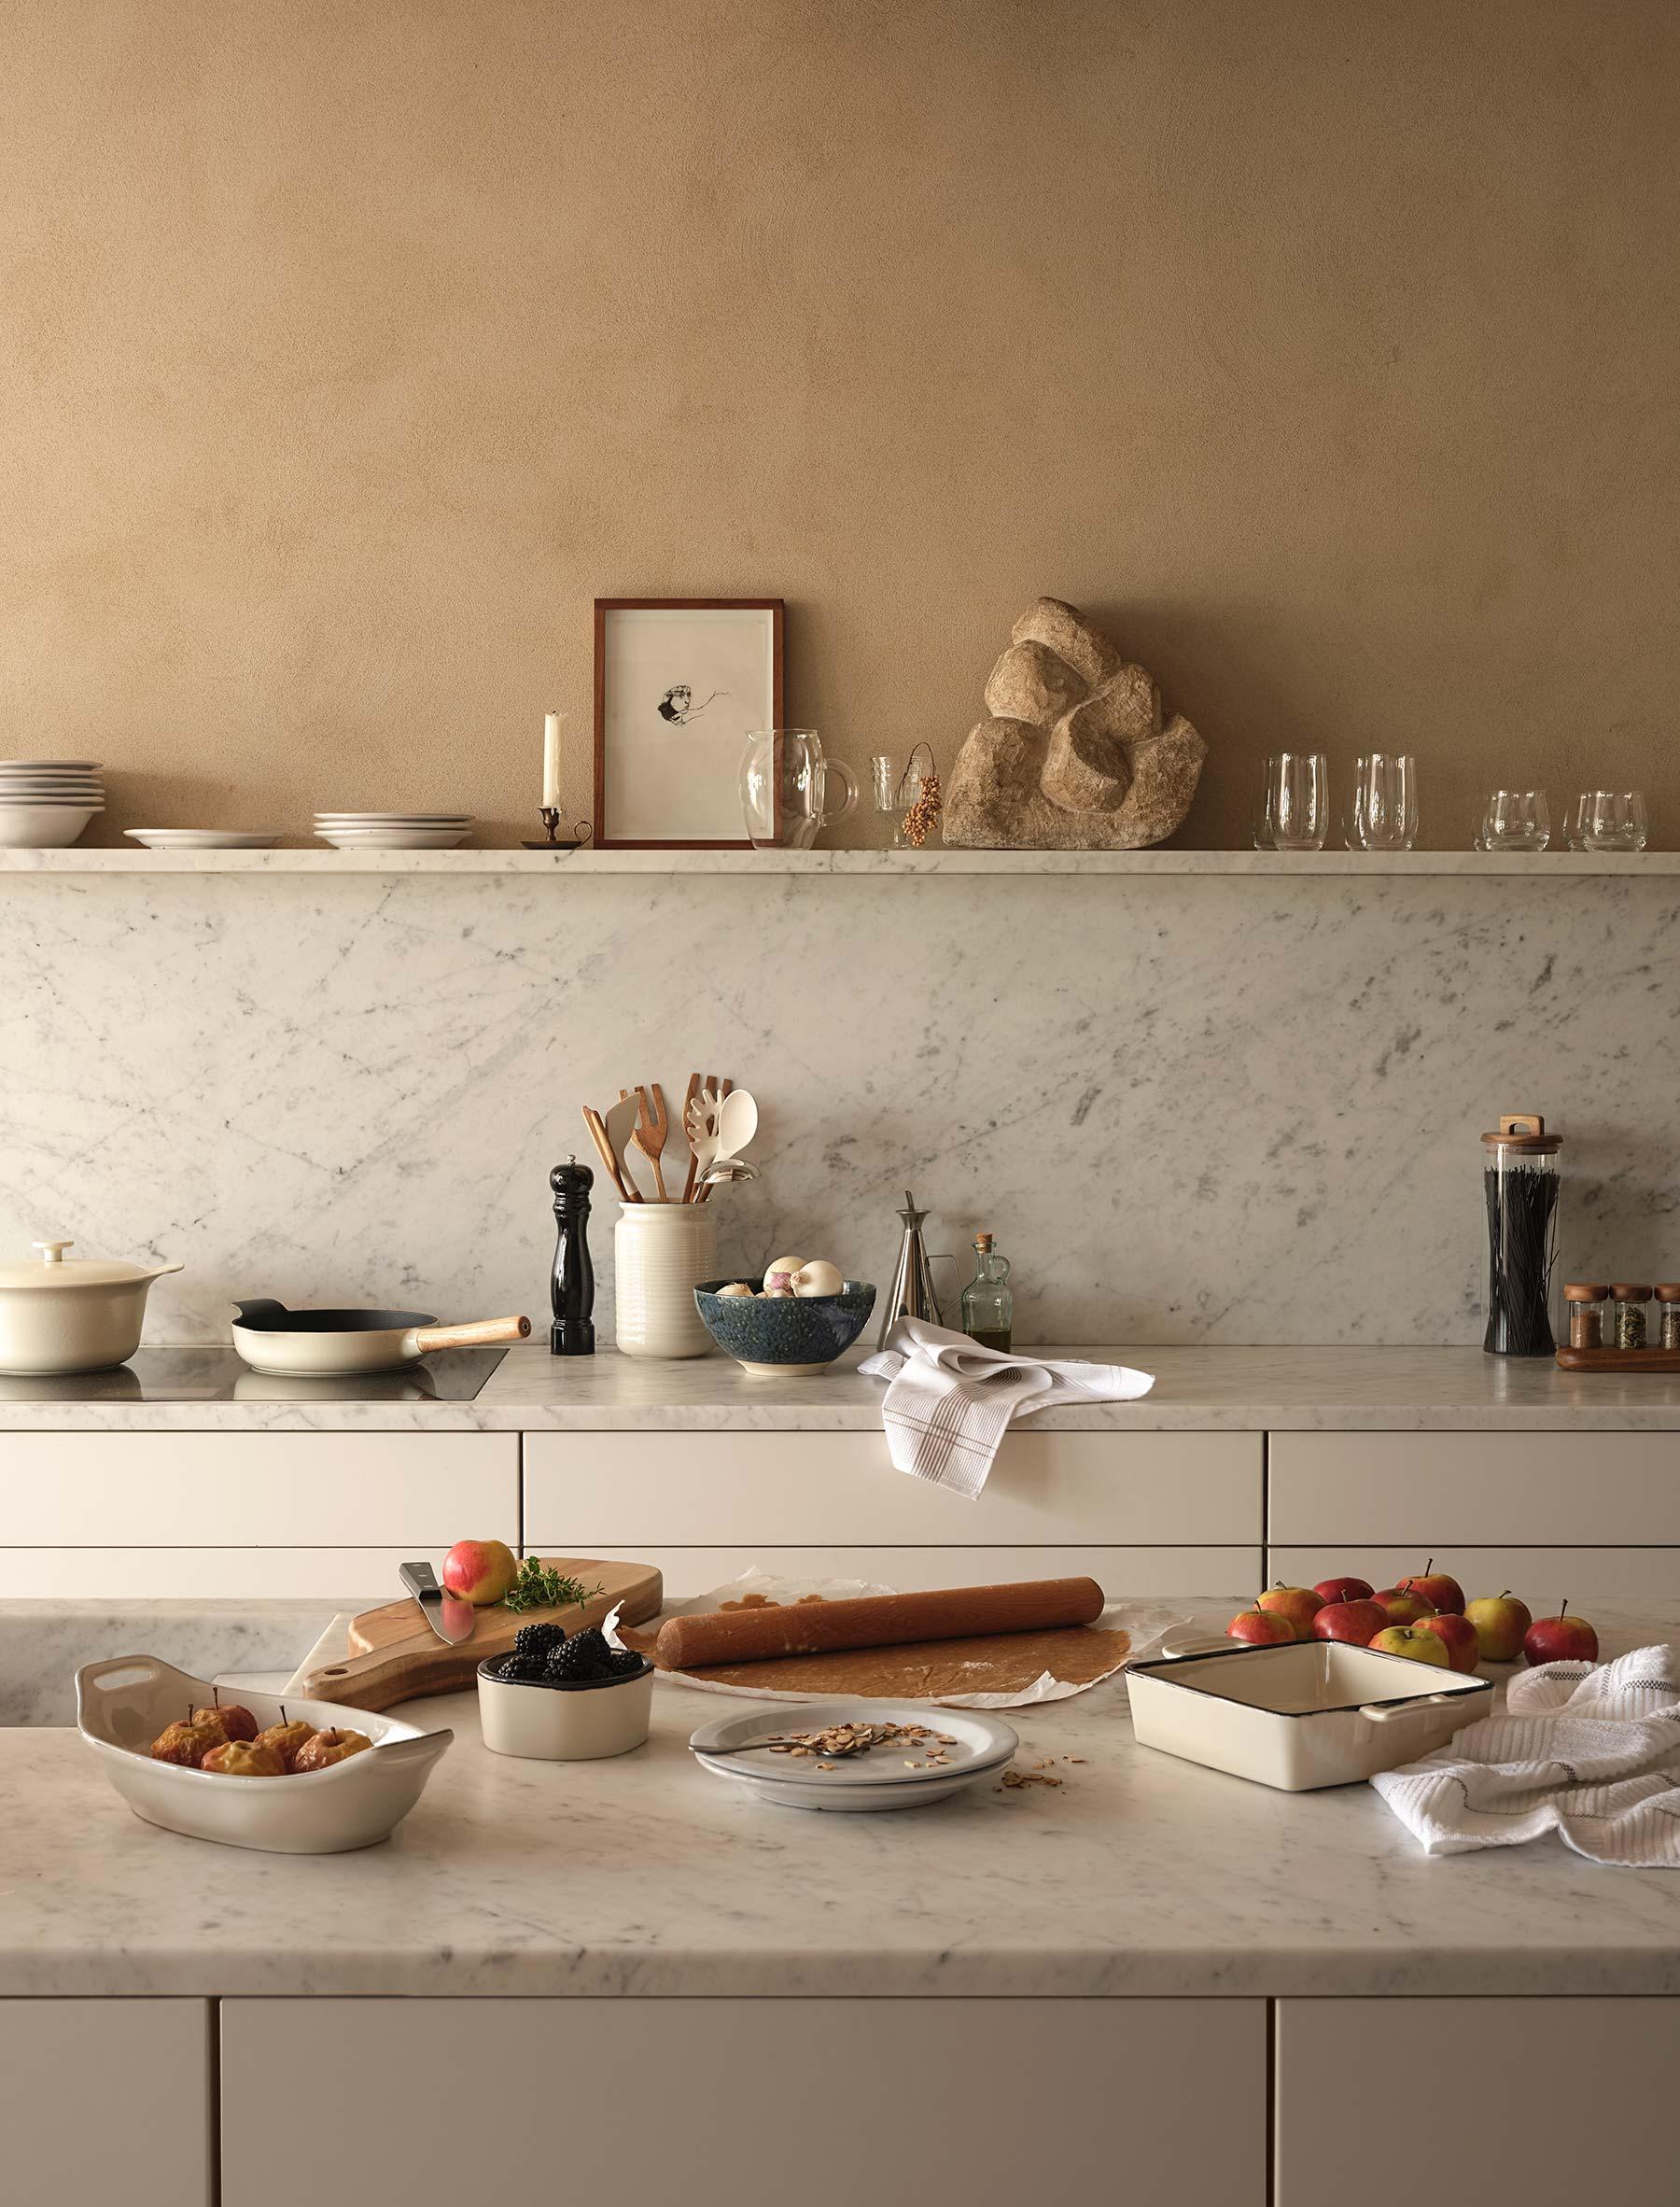 Surprising Zara Home F W 19 Kitchen Collection Zoe Olivia Download Free Architecture Designs Rallybritishbridgeorg